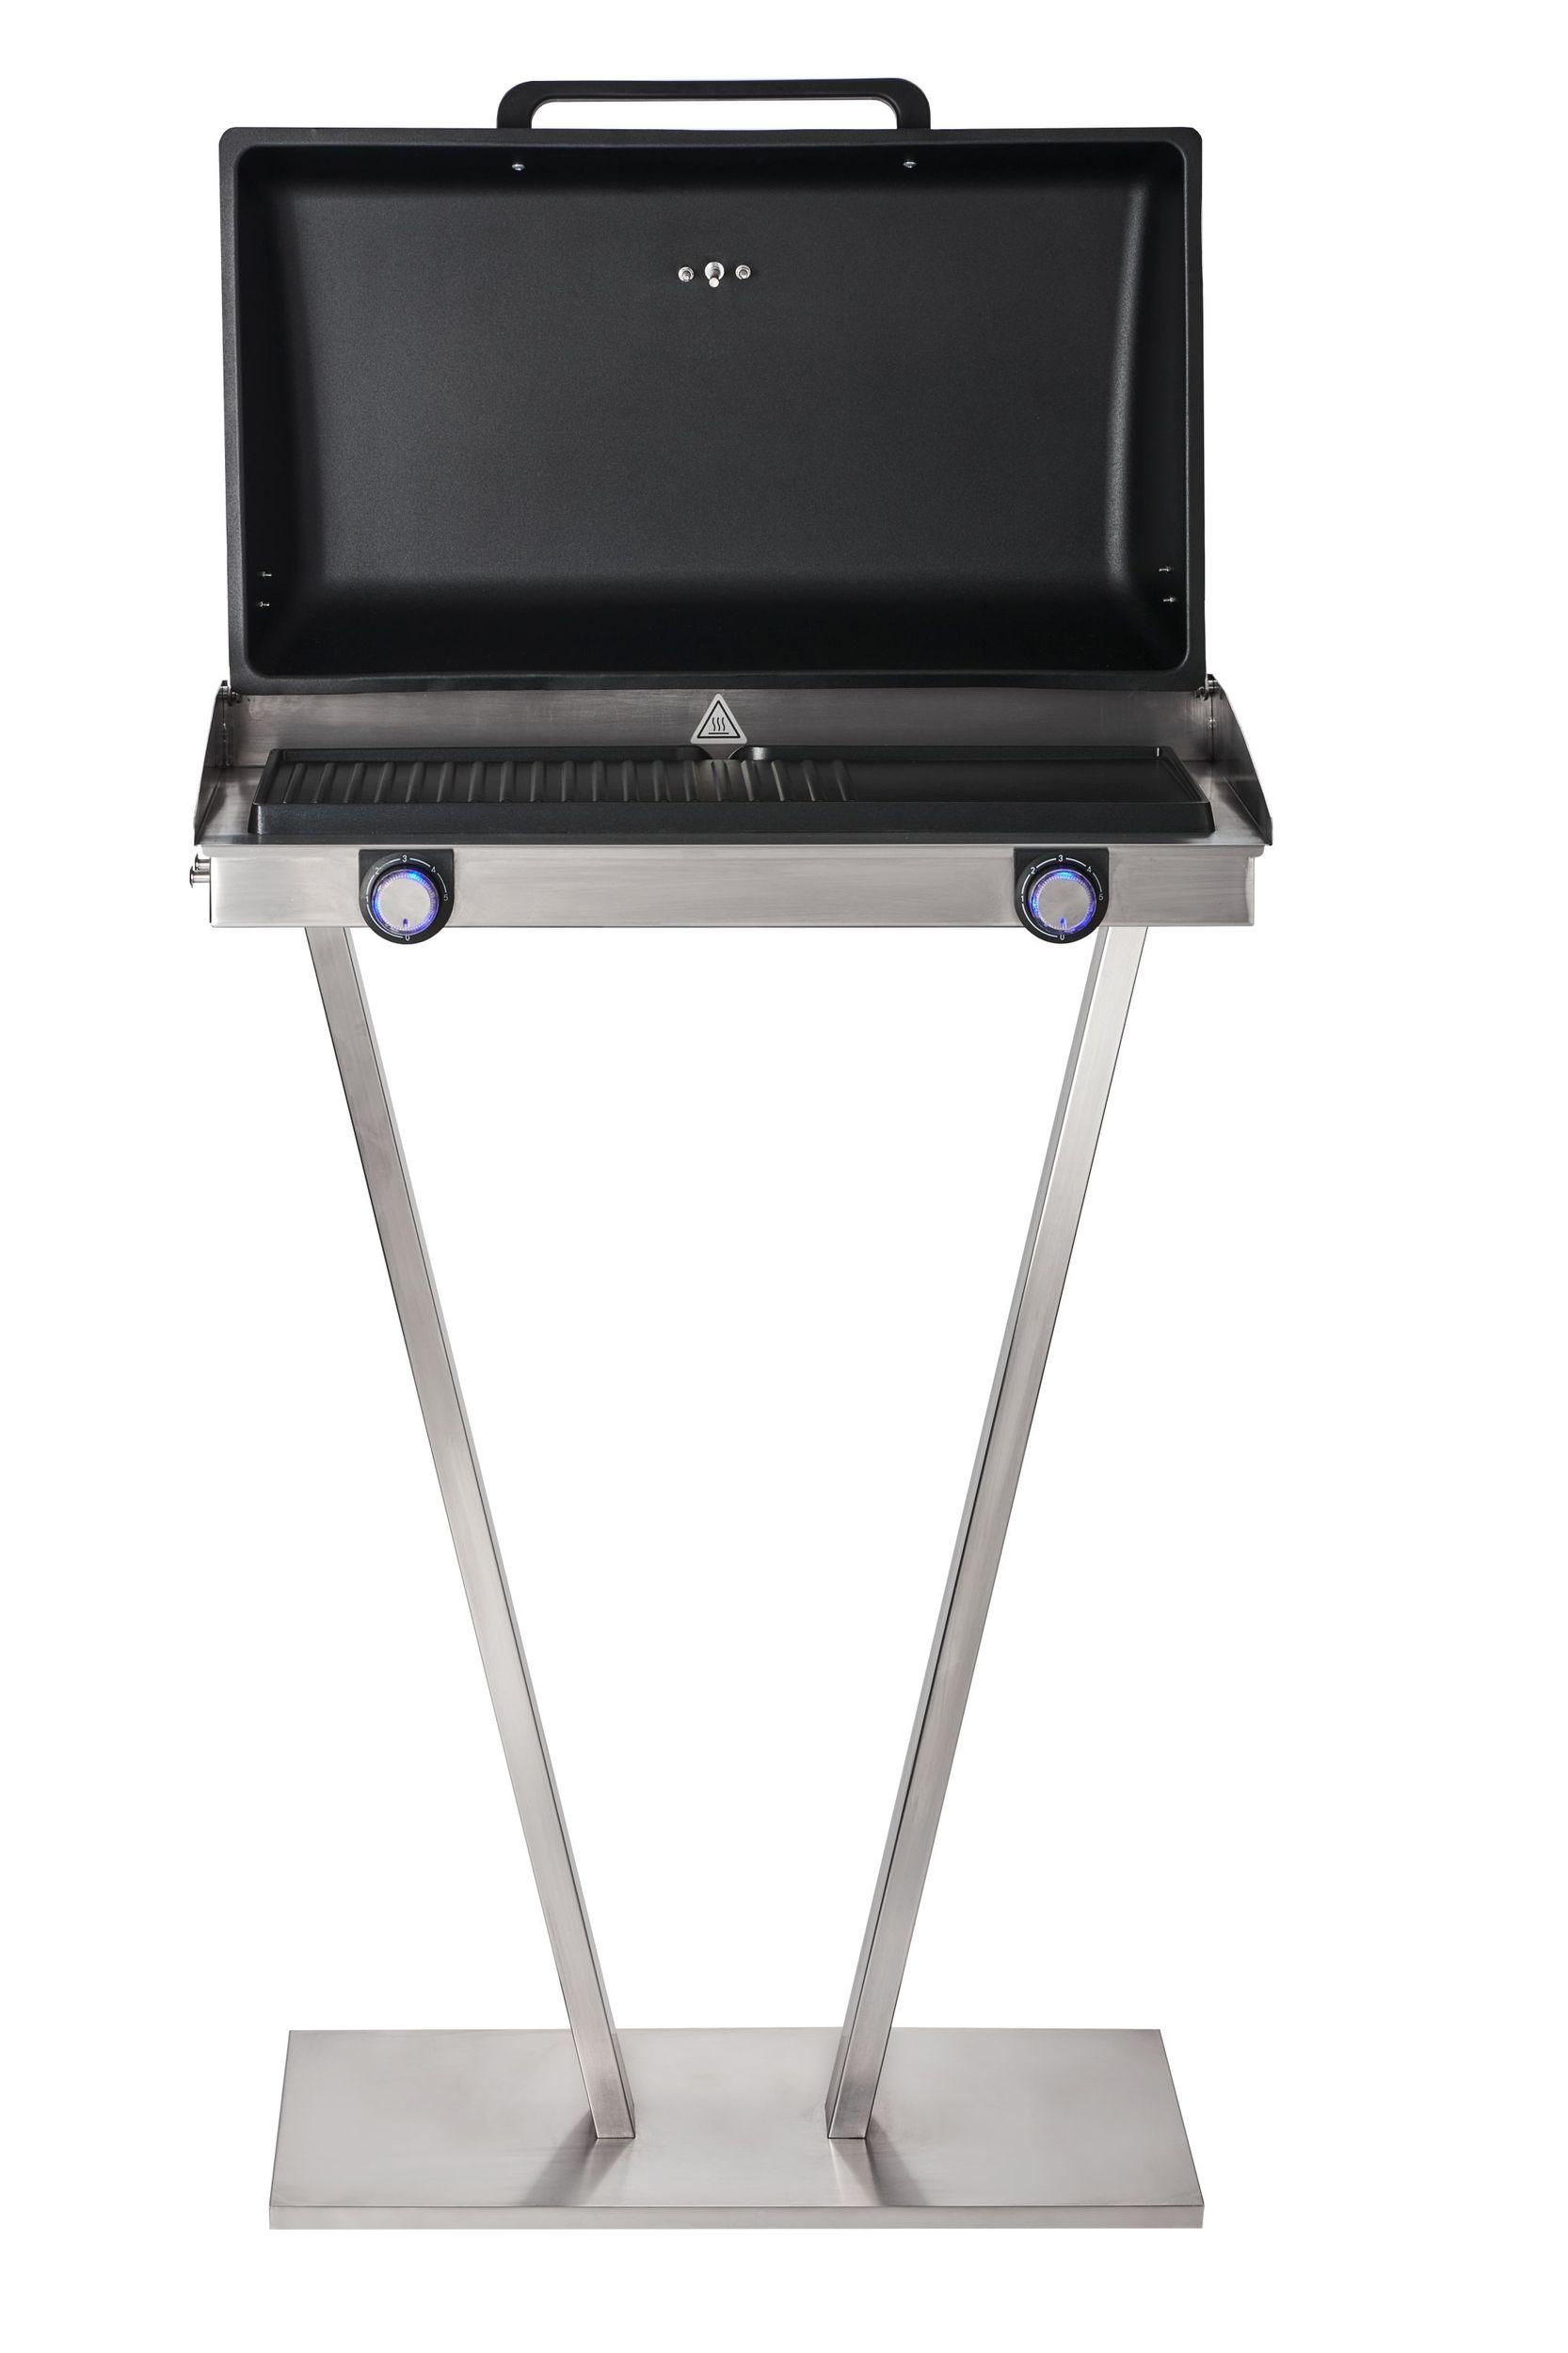 elektrischer Barbecuegrill Standgrill Elektrogrill Edelstahl Karton defekt*01405